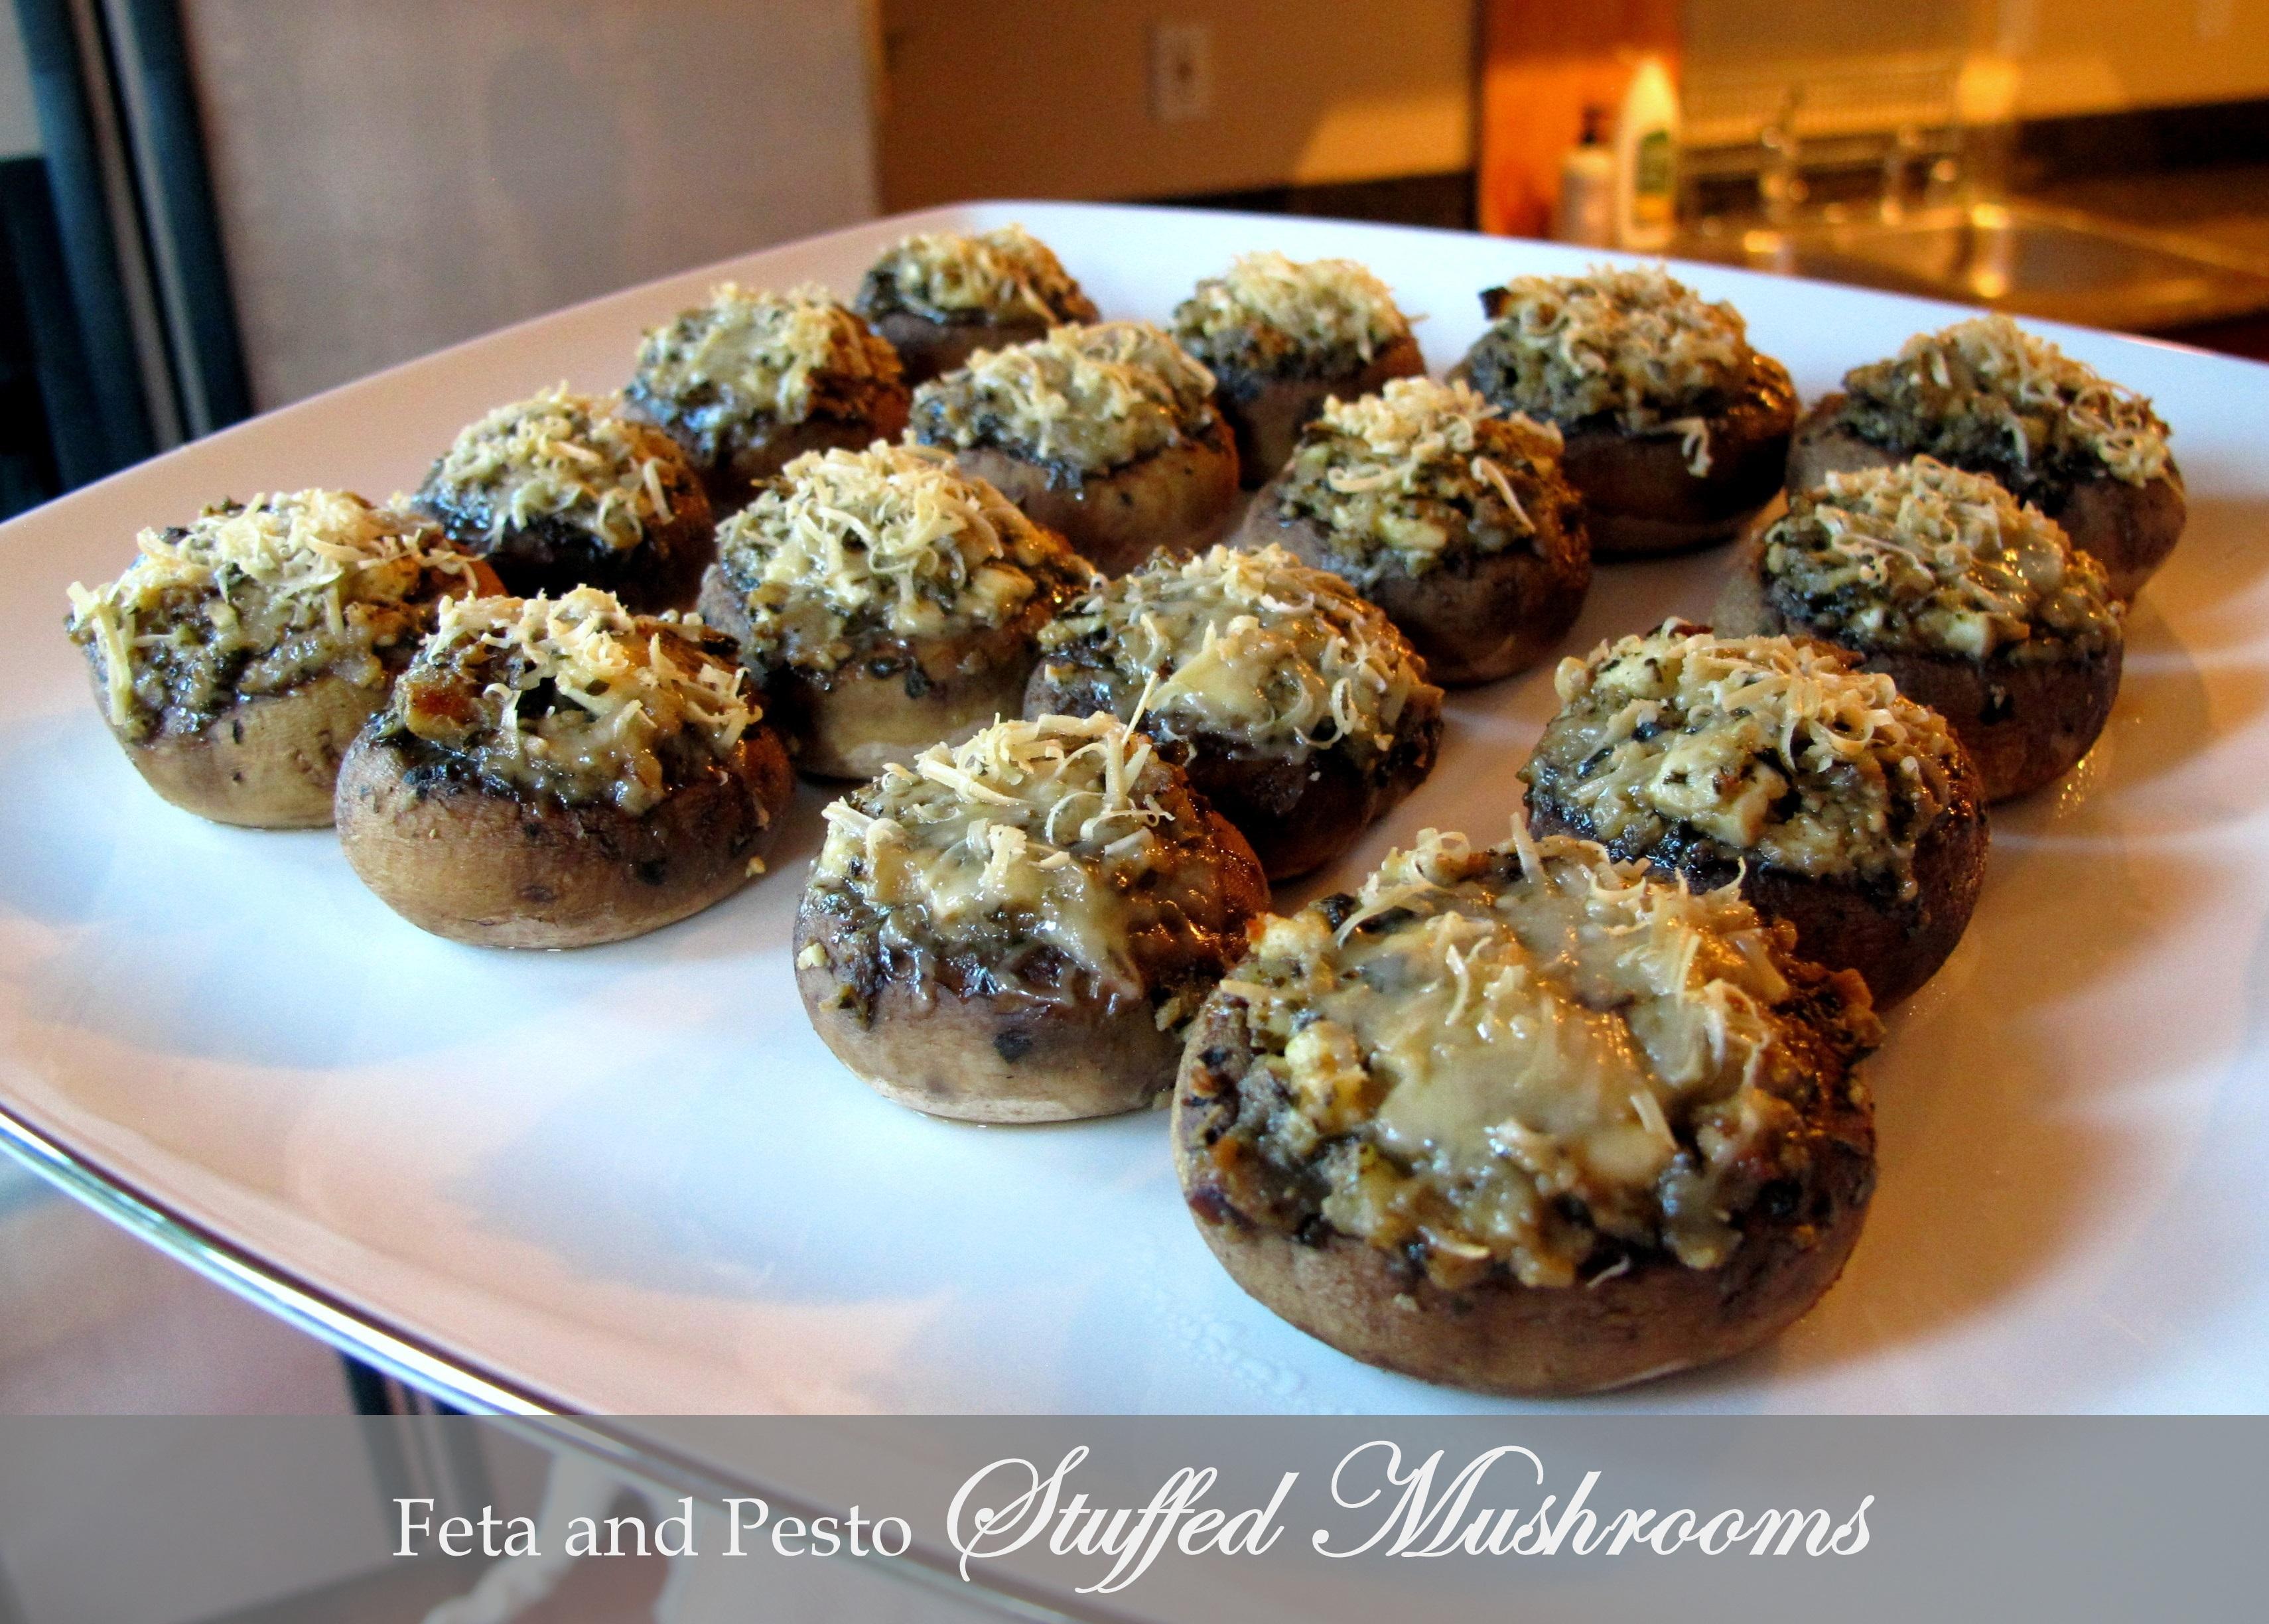 Feta and Pesto Stuffed Mushrooms - Fructose Friendly, Gluten Free and ...